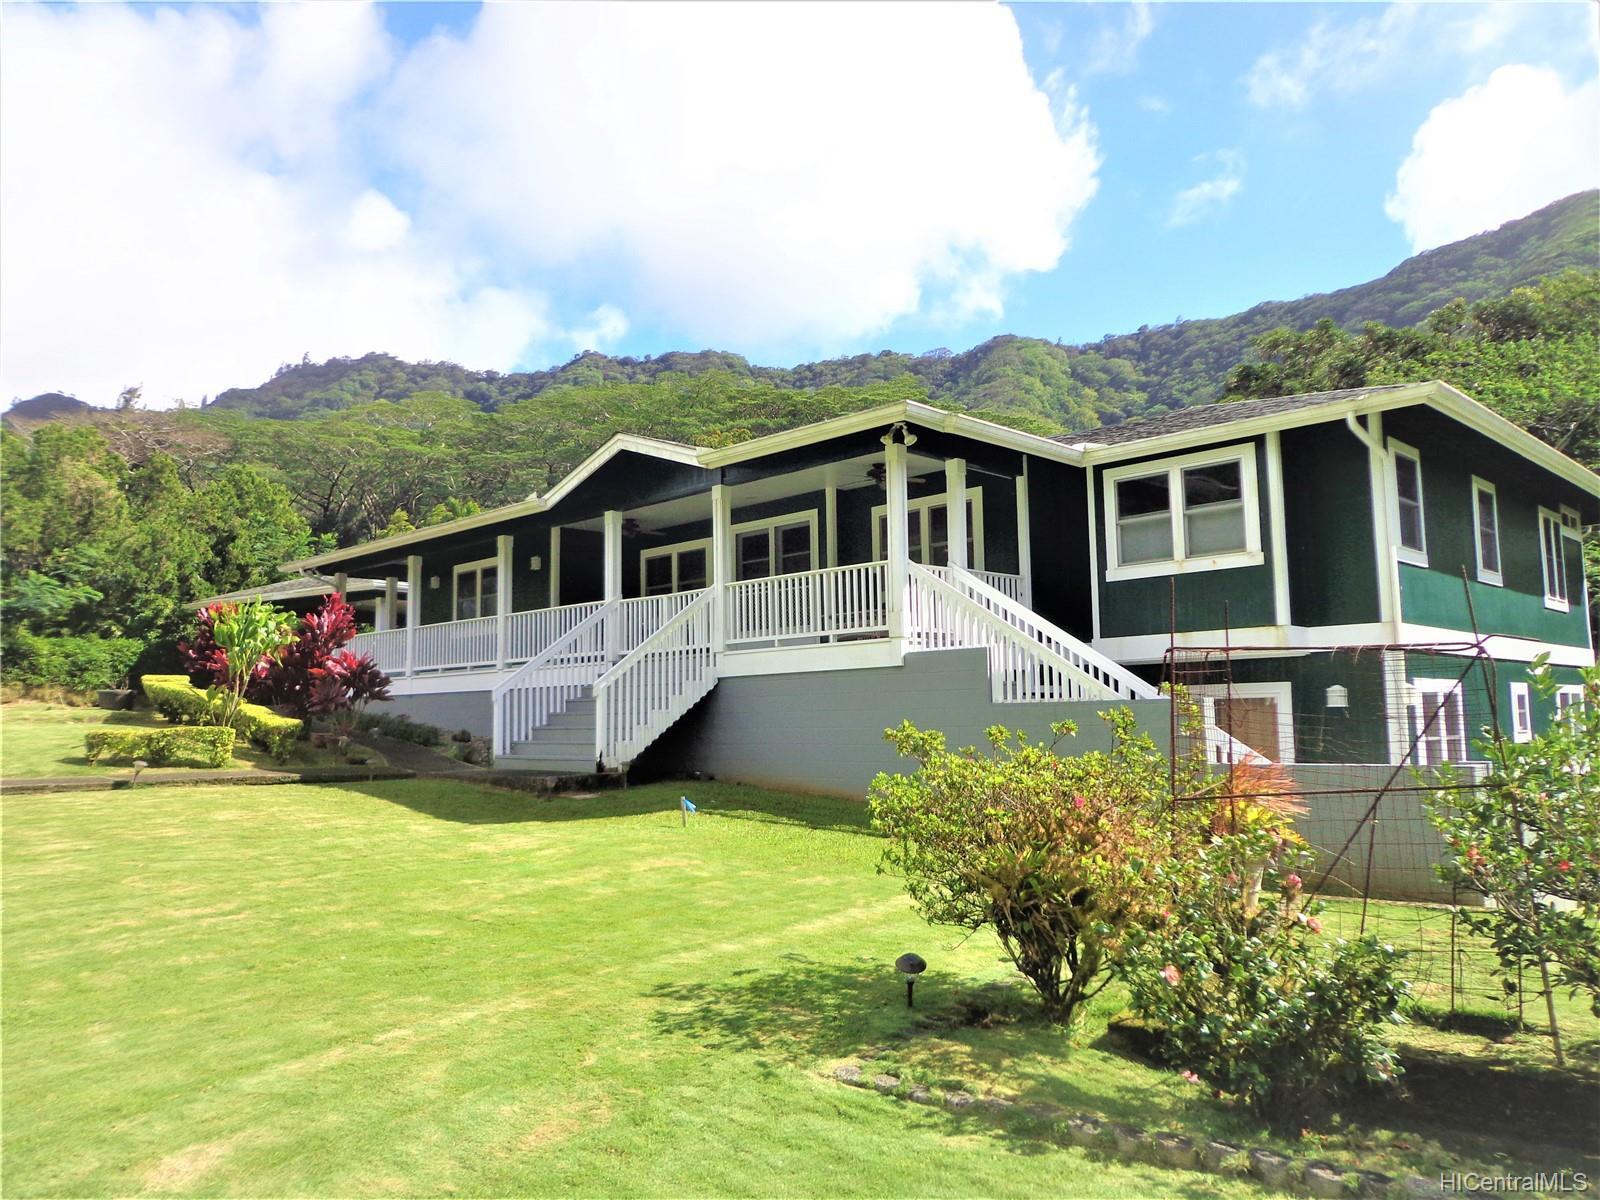 3555 A Kalihi Street 3 Honolulu Hi 96819   Kalihi Valley home 1600x1200